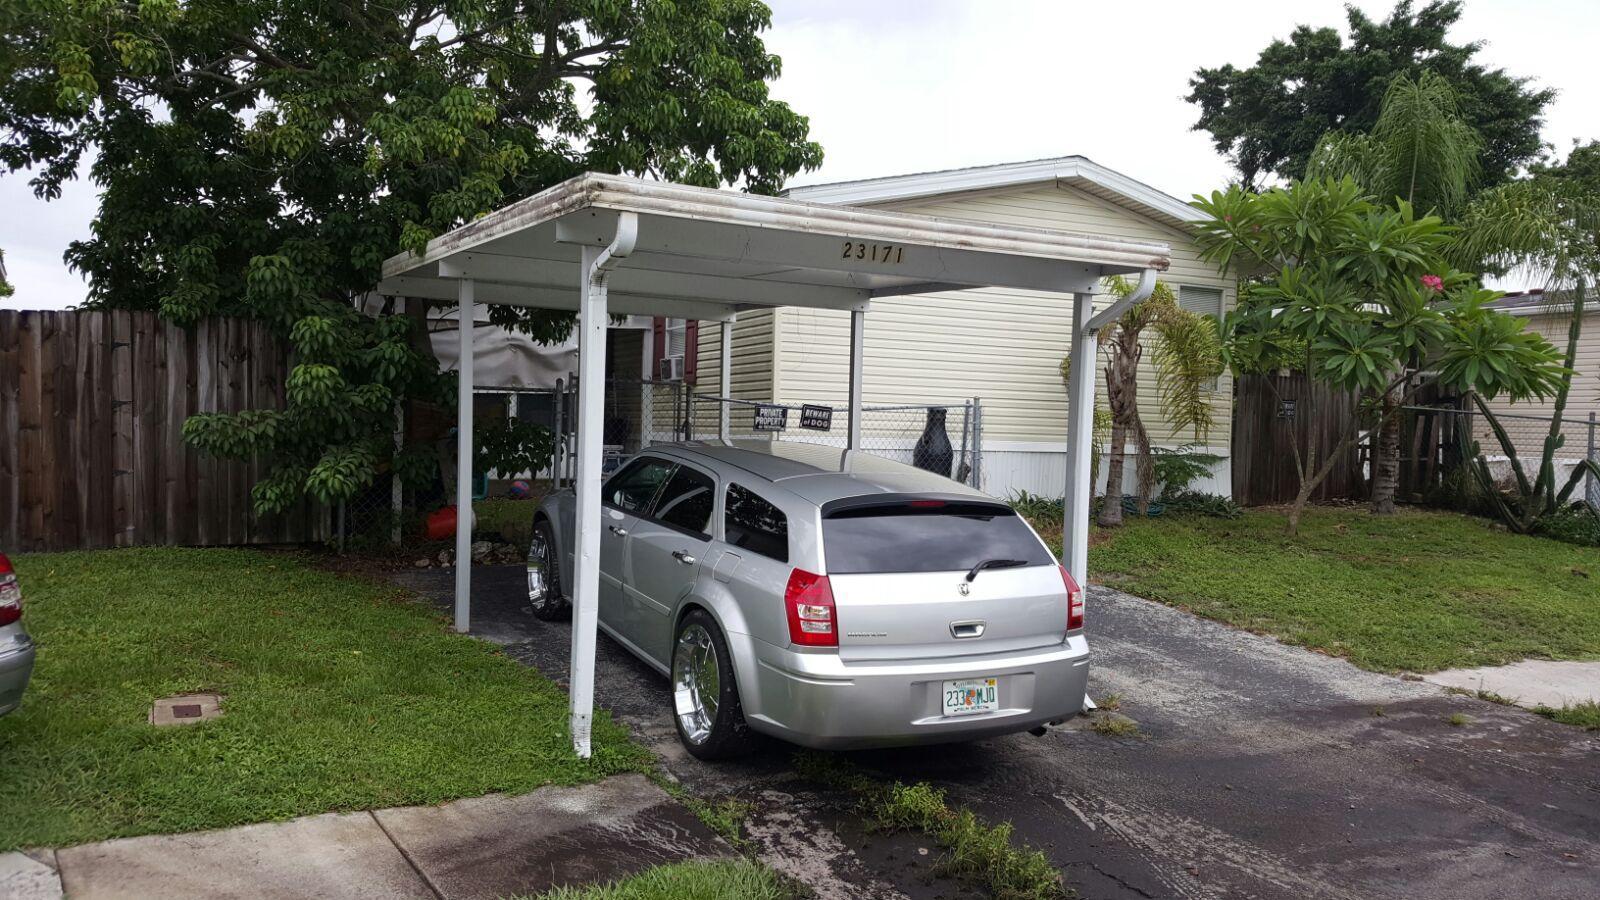 23171 Rainbow Road, Boca Raton, FL 33428